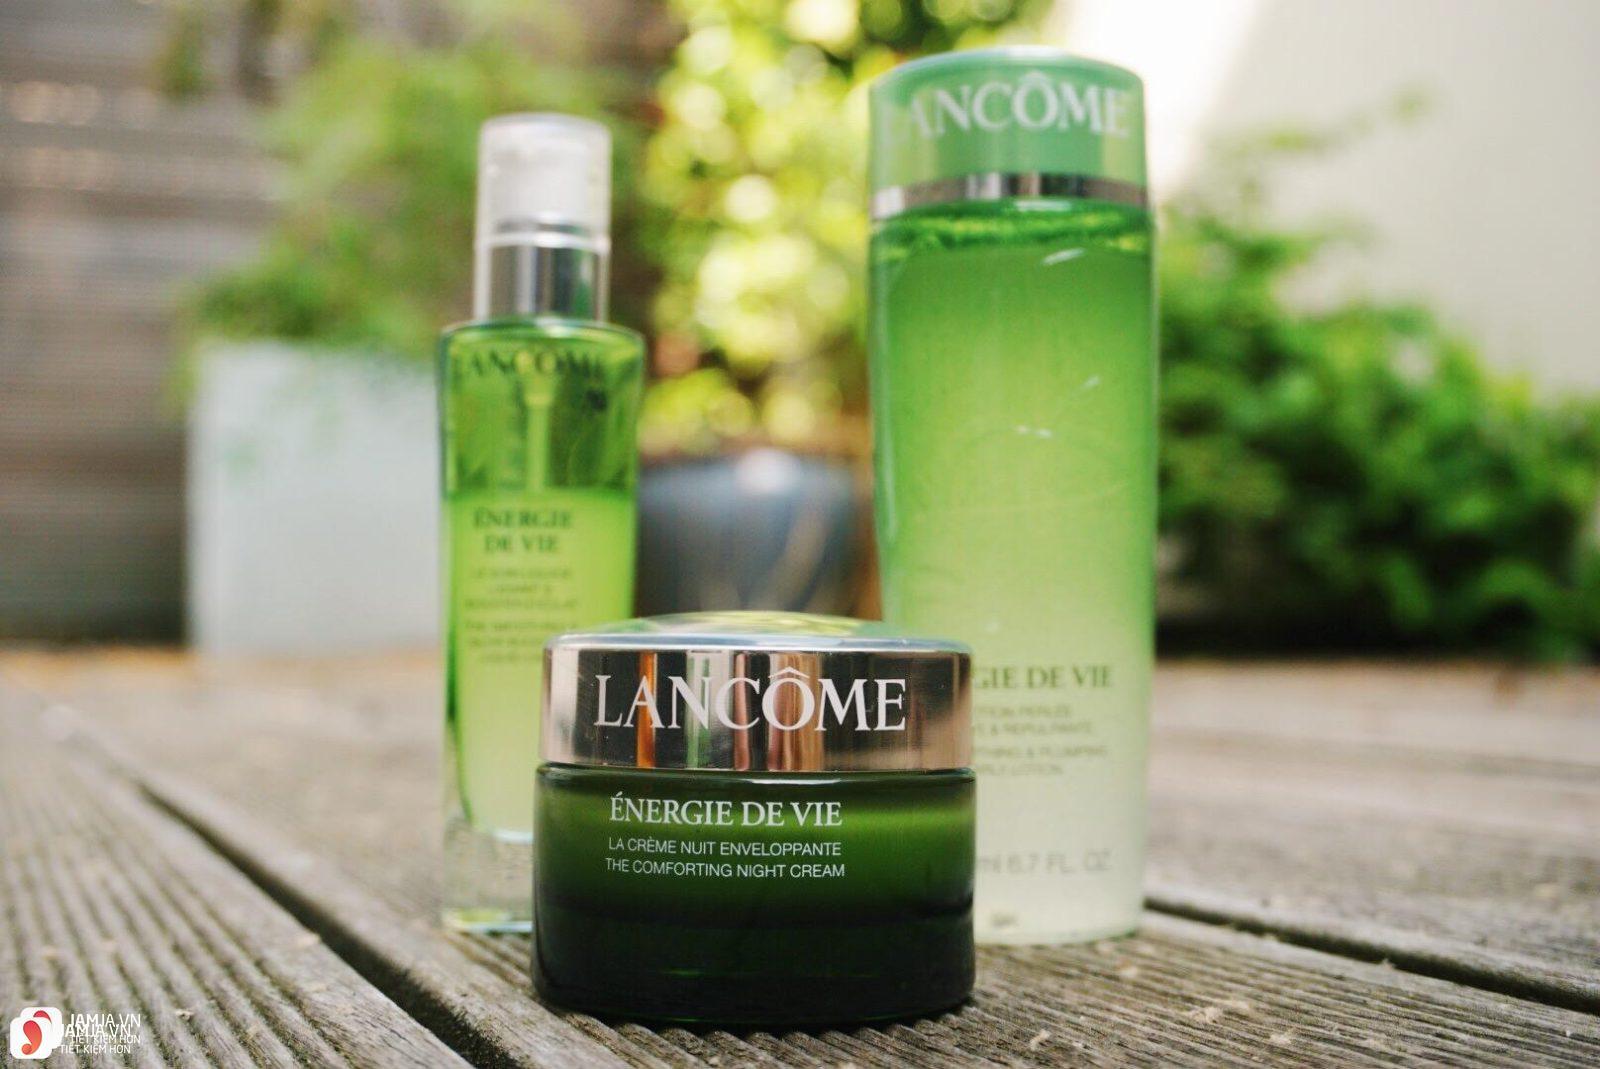 Kem dưỡng ẩm da mặt LancomeEnergie De Vie Day Cream Water Infused Moiturizing